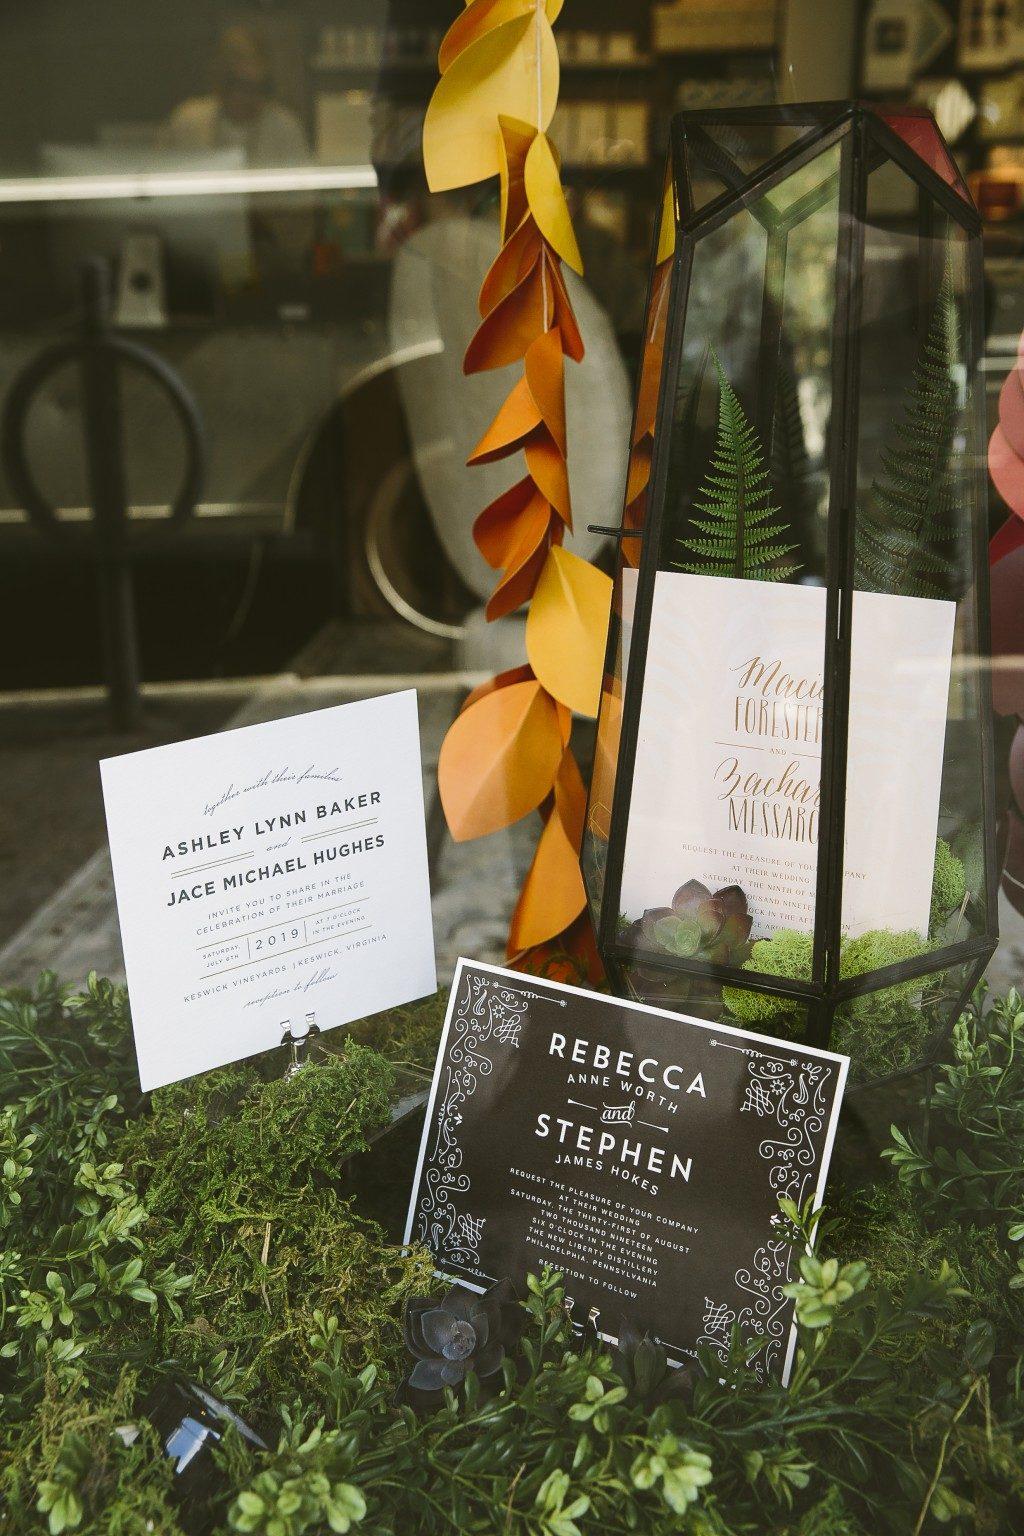 Bella Figura's flagship store window displays in Manhattan